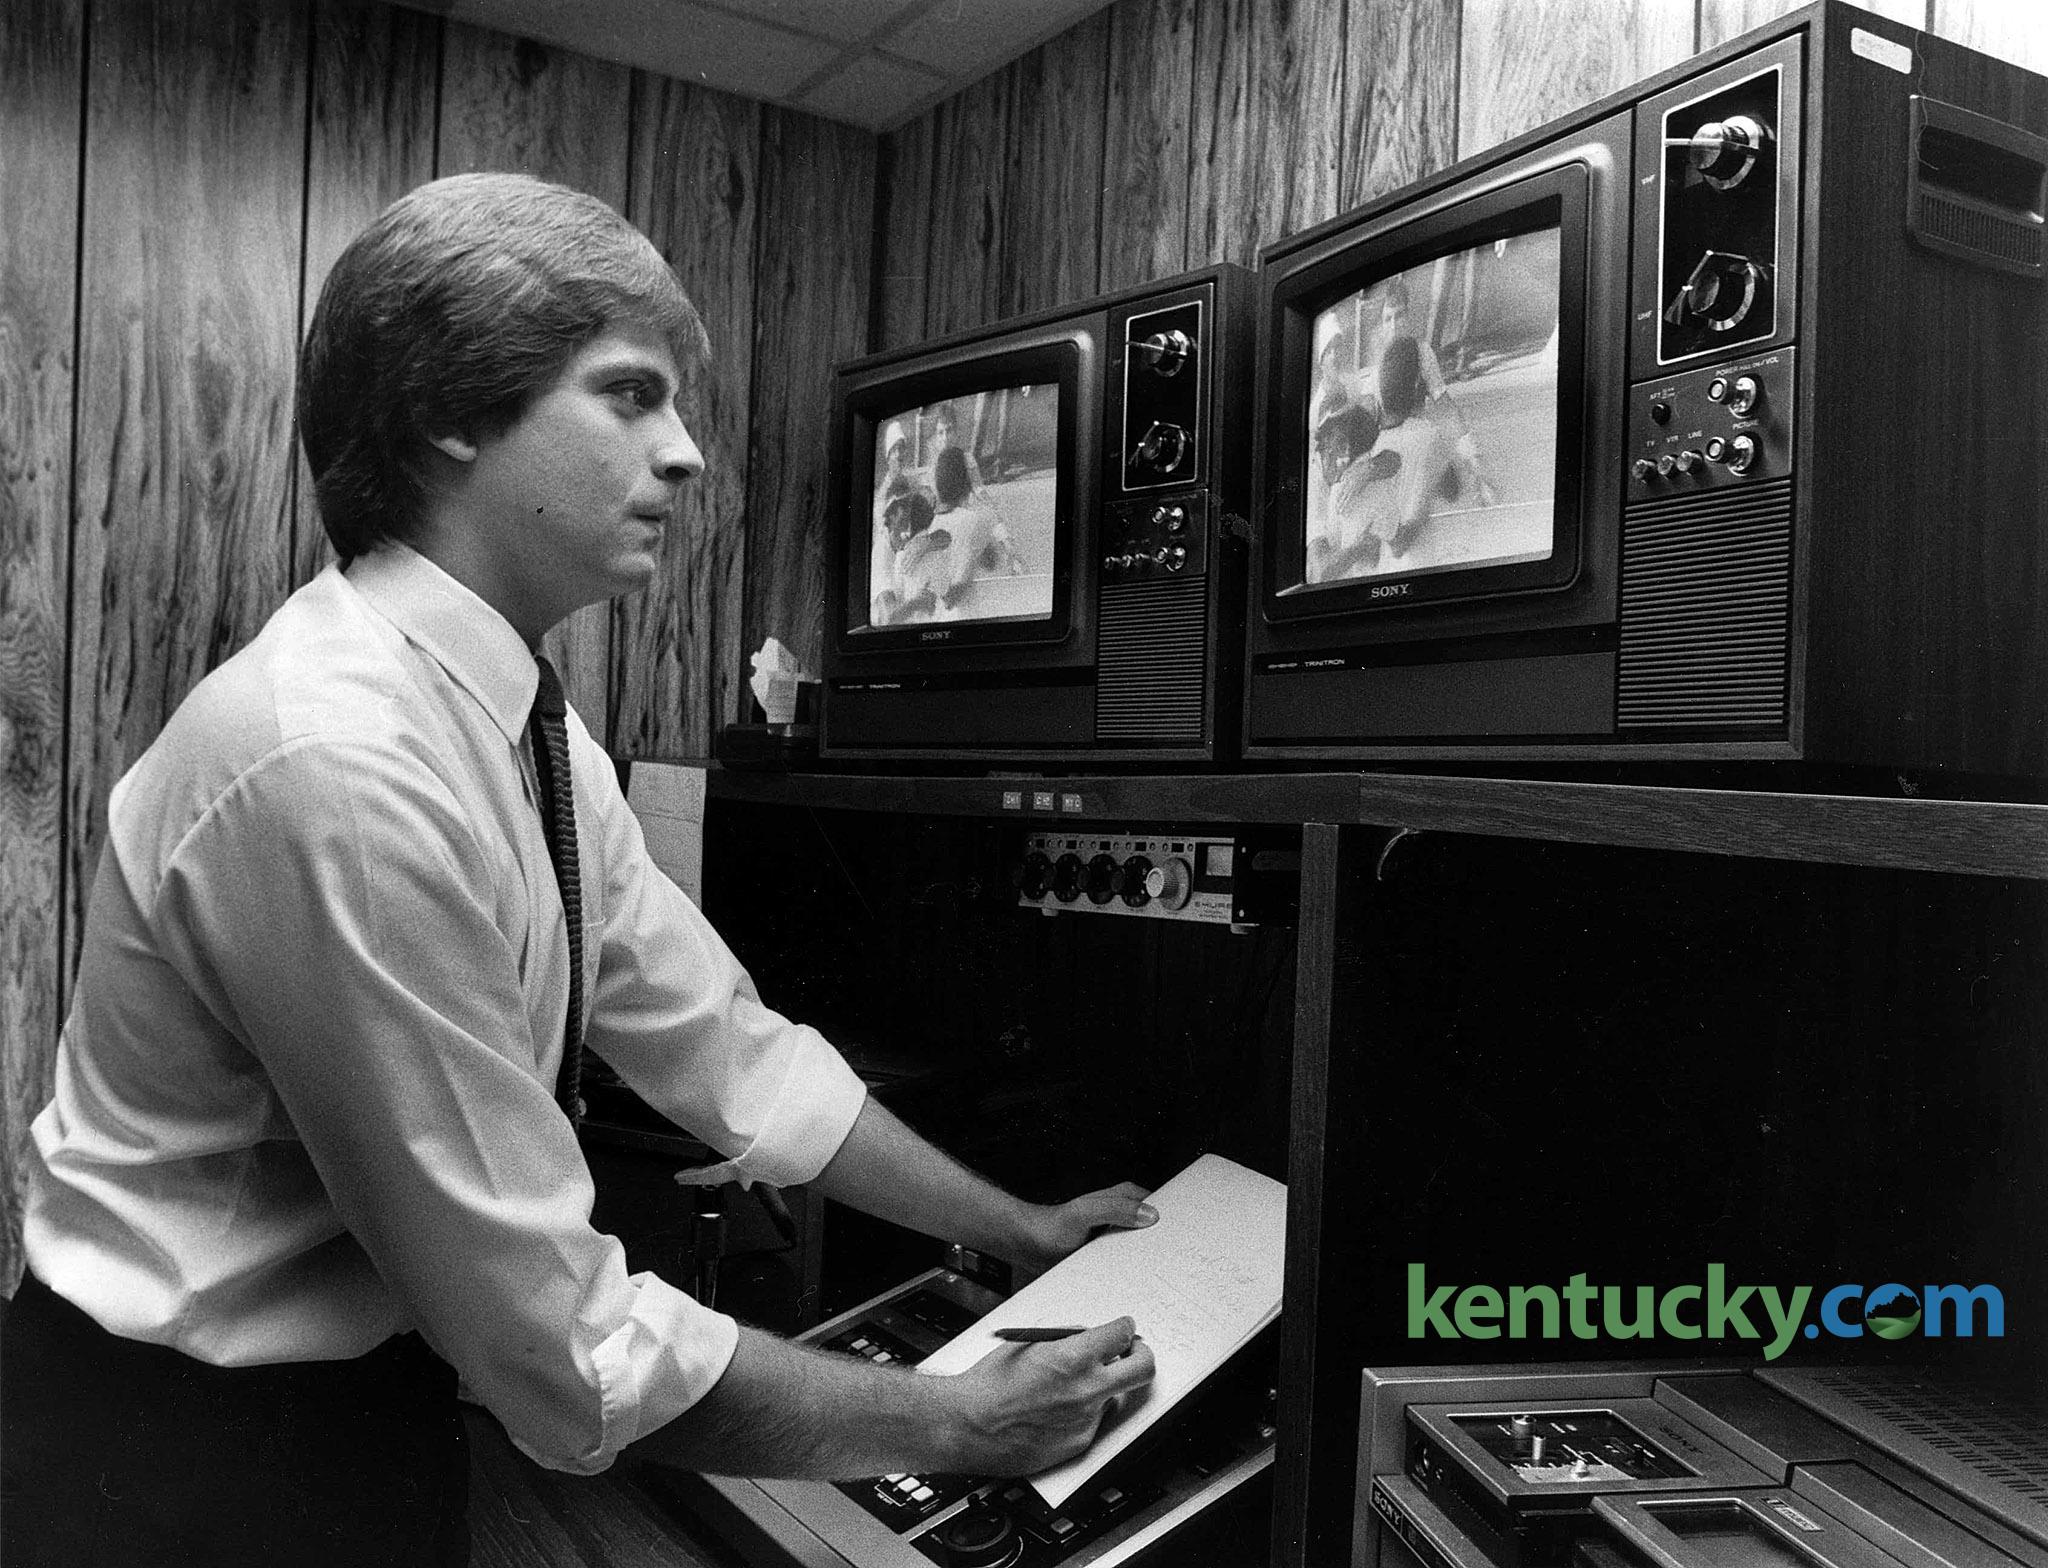 Kentucky Photo Archive | Photos from the Lexington Herald